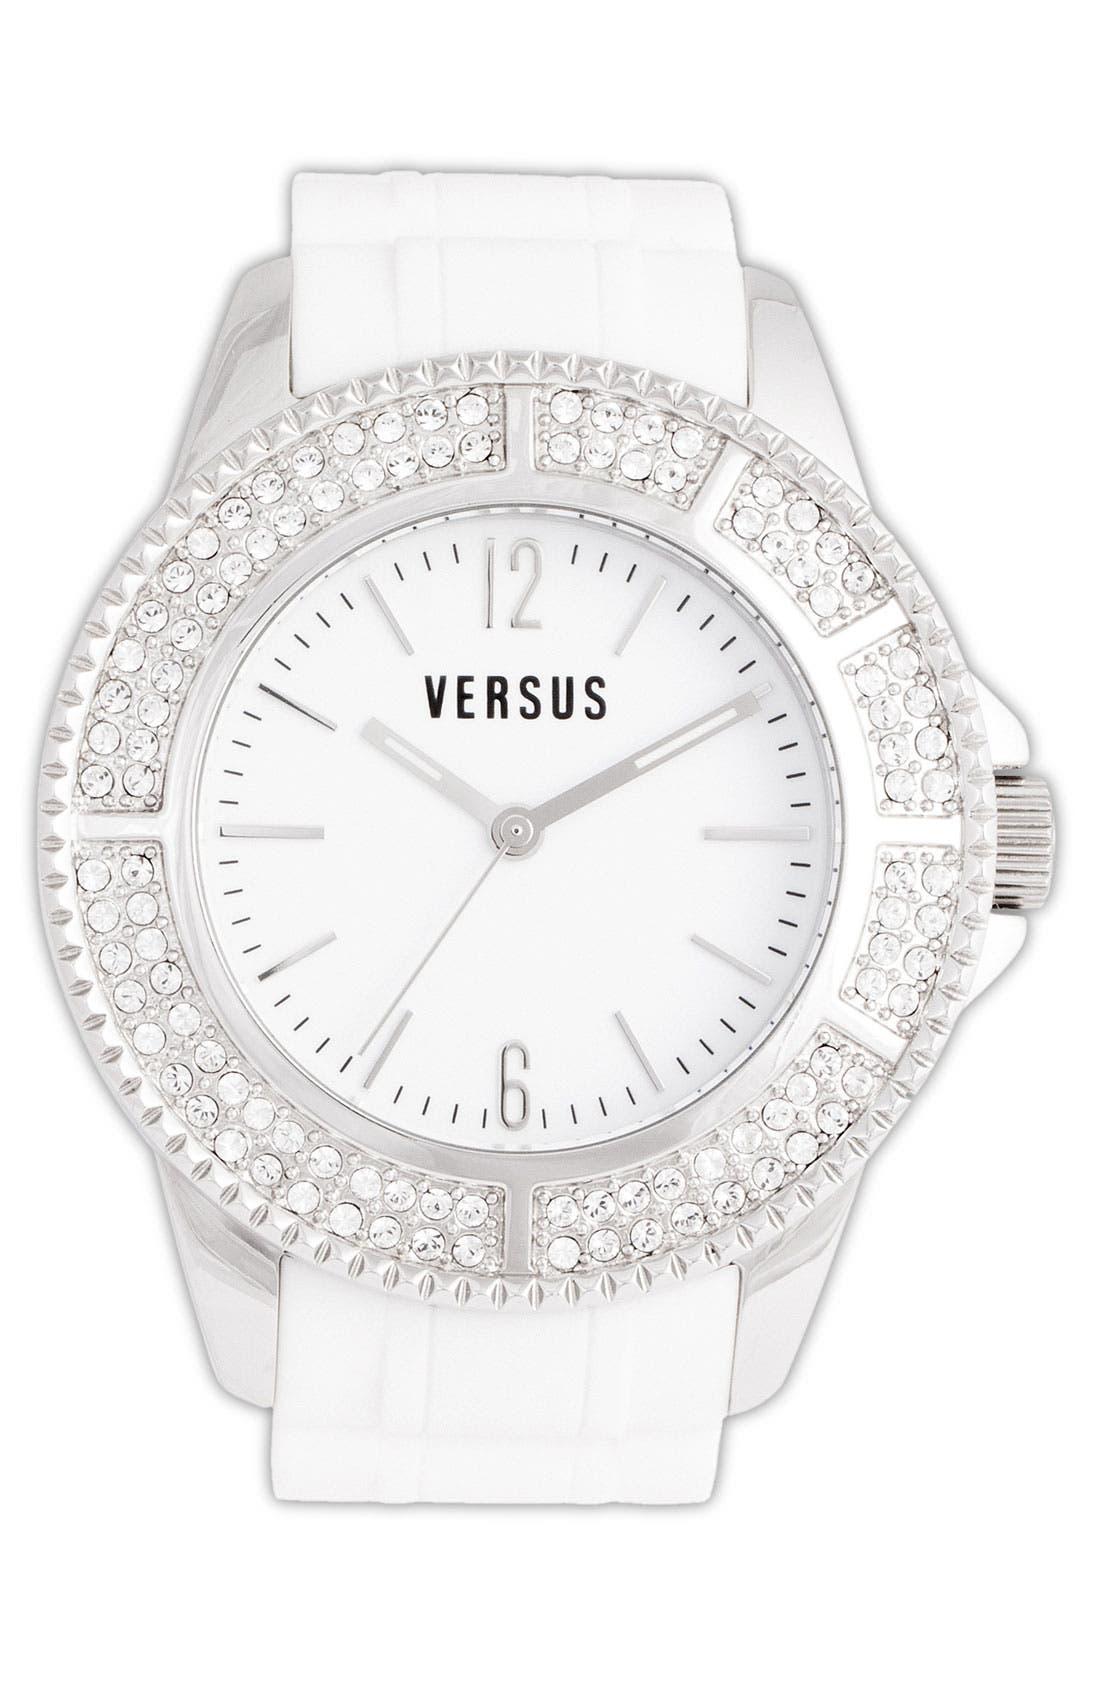 Main Image - VERSUS by Versace 'Tokyo' Crystal Bezel Rubber Strap Watch, 42mm